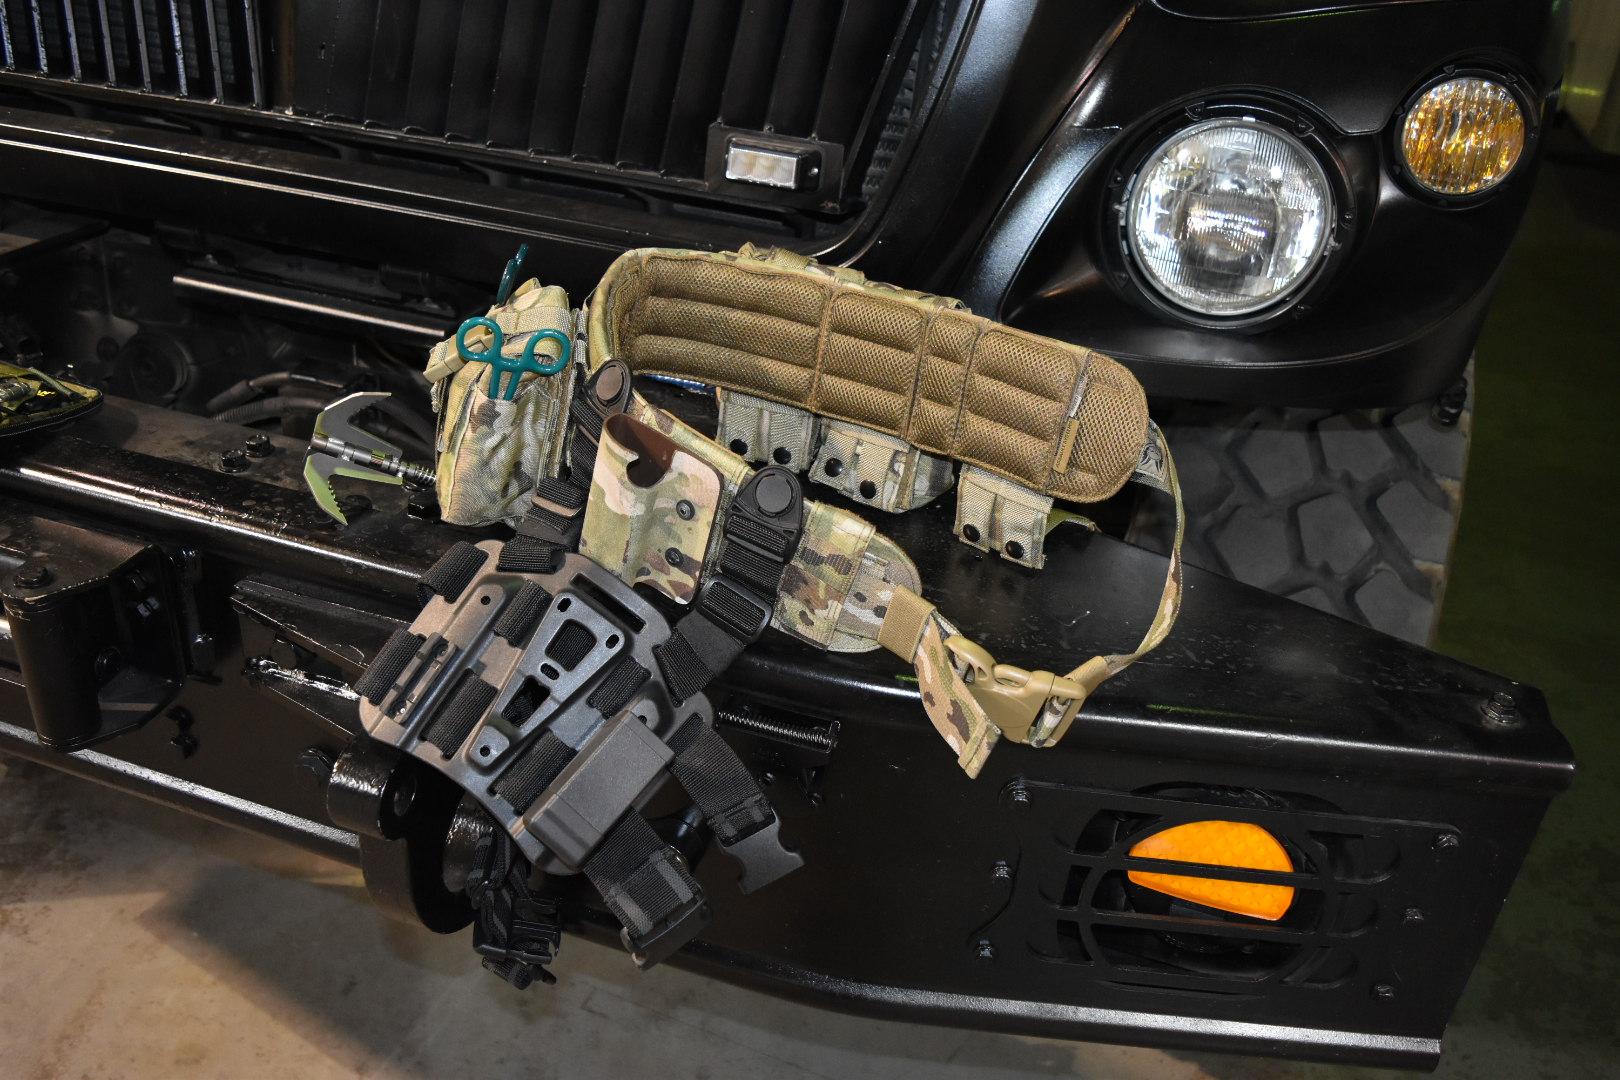 dismounted-eod-operator-gun-fighter-belt-multicam.jpg